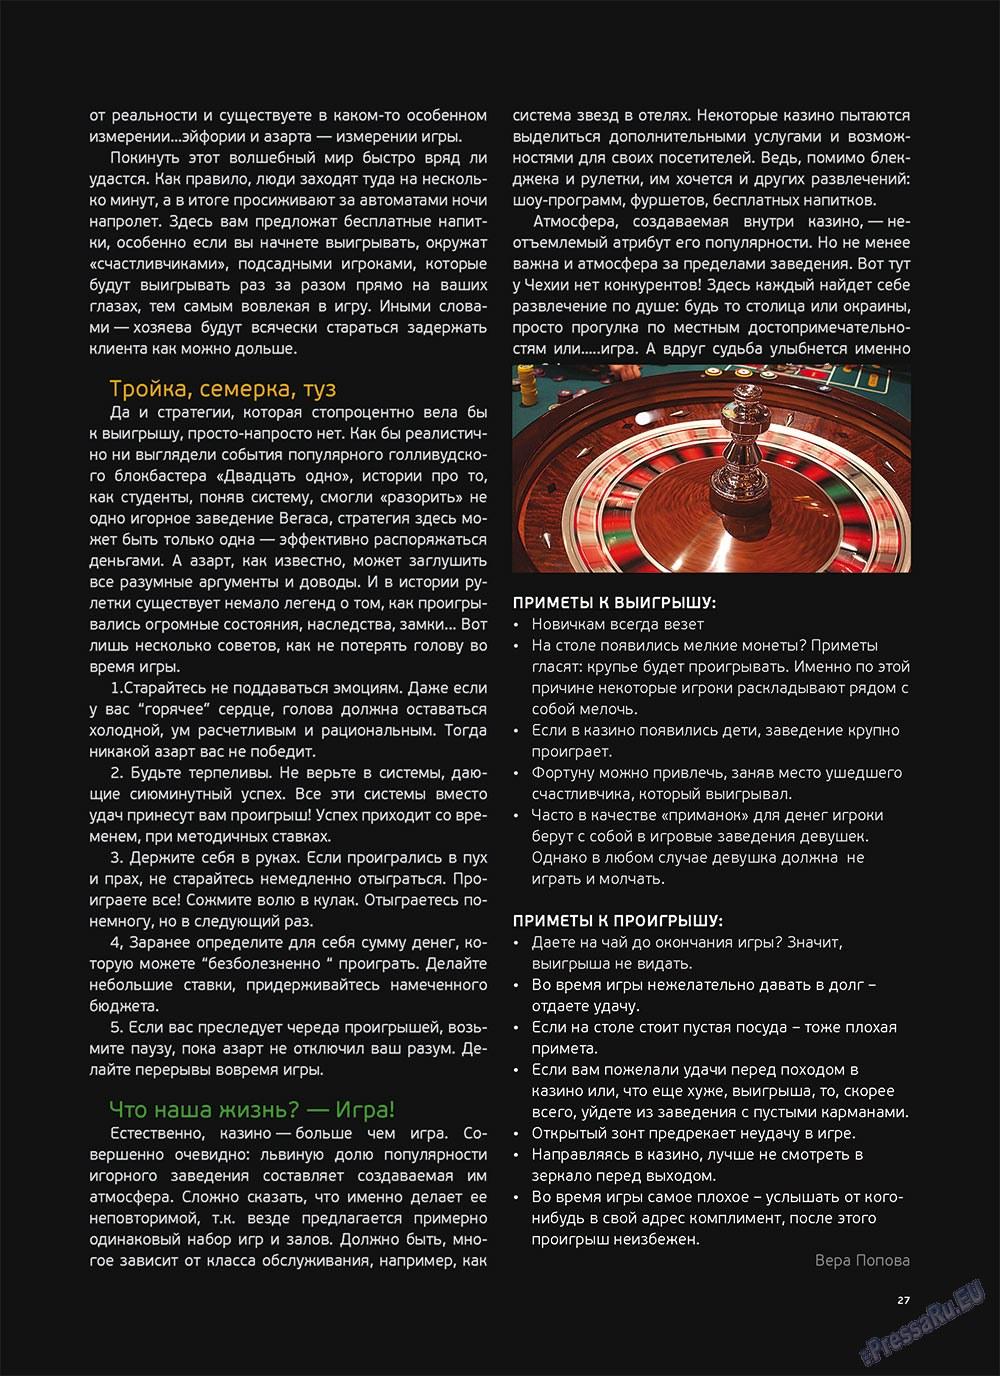 Артек (журнал). 2011 год, номер 5, стр. 29